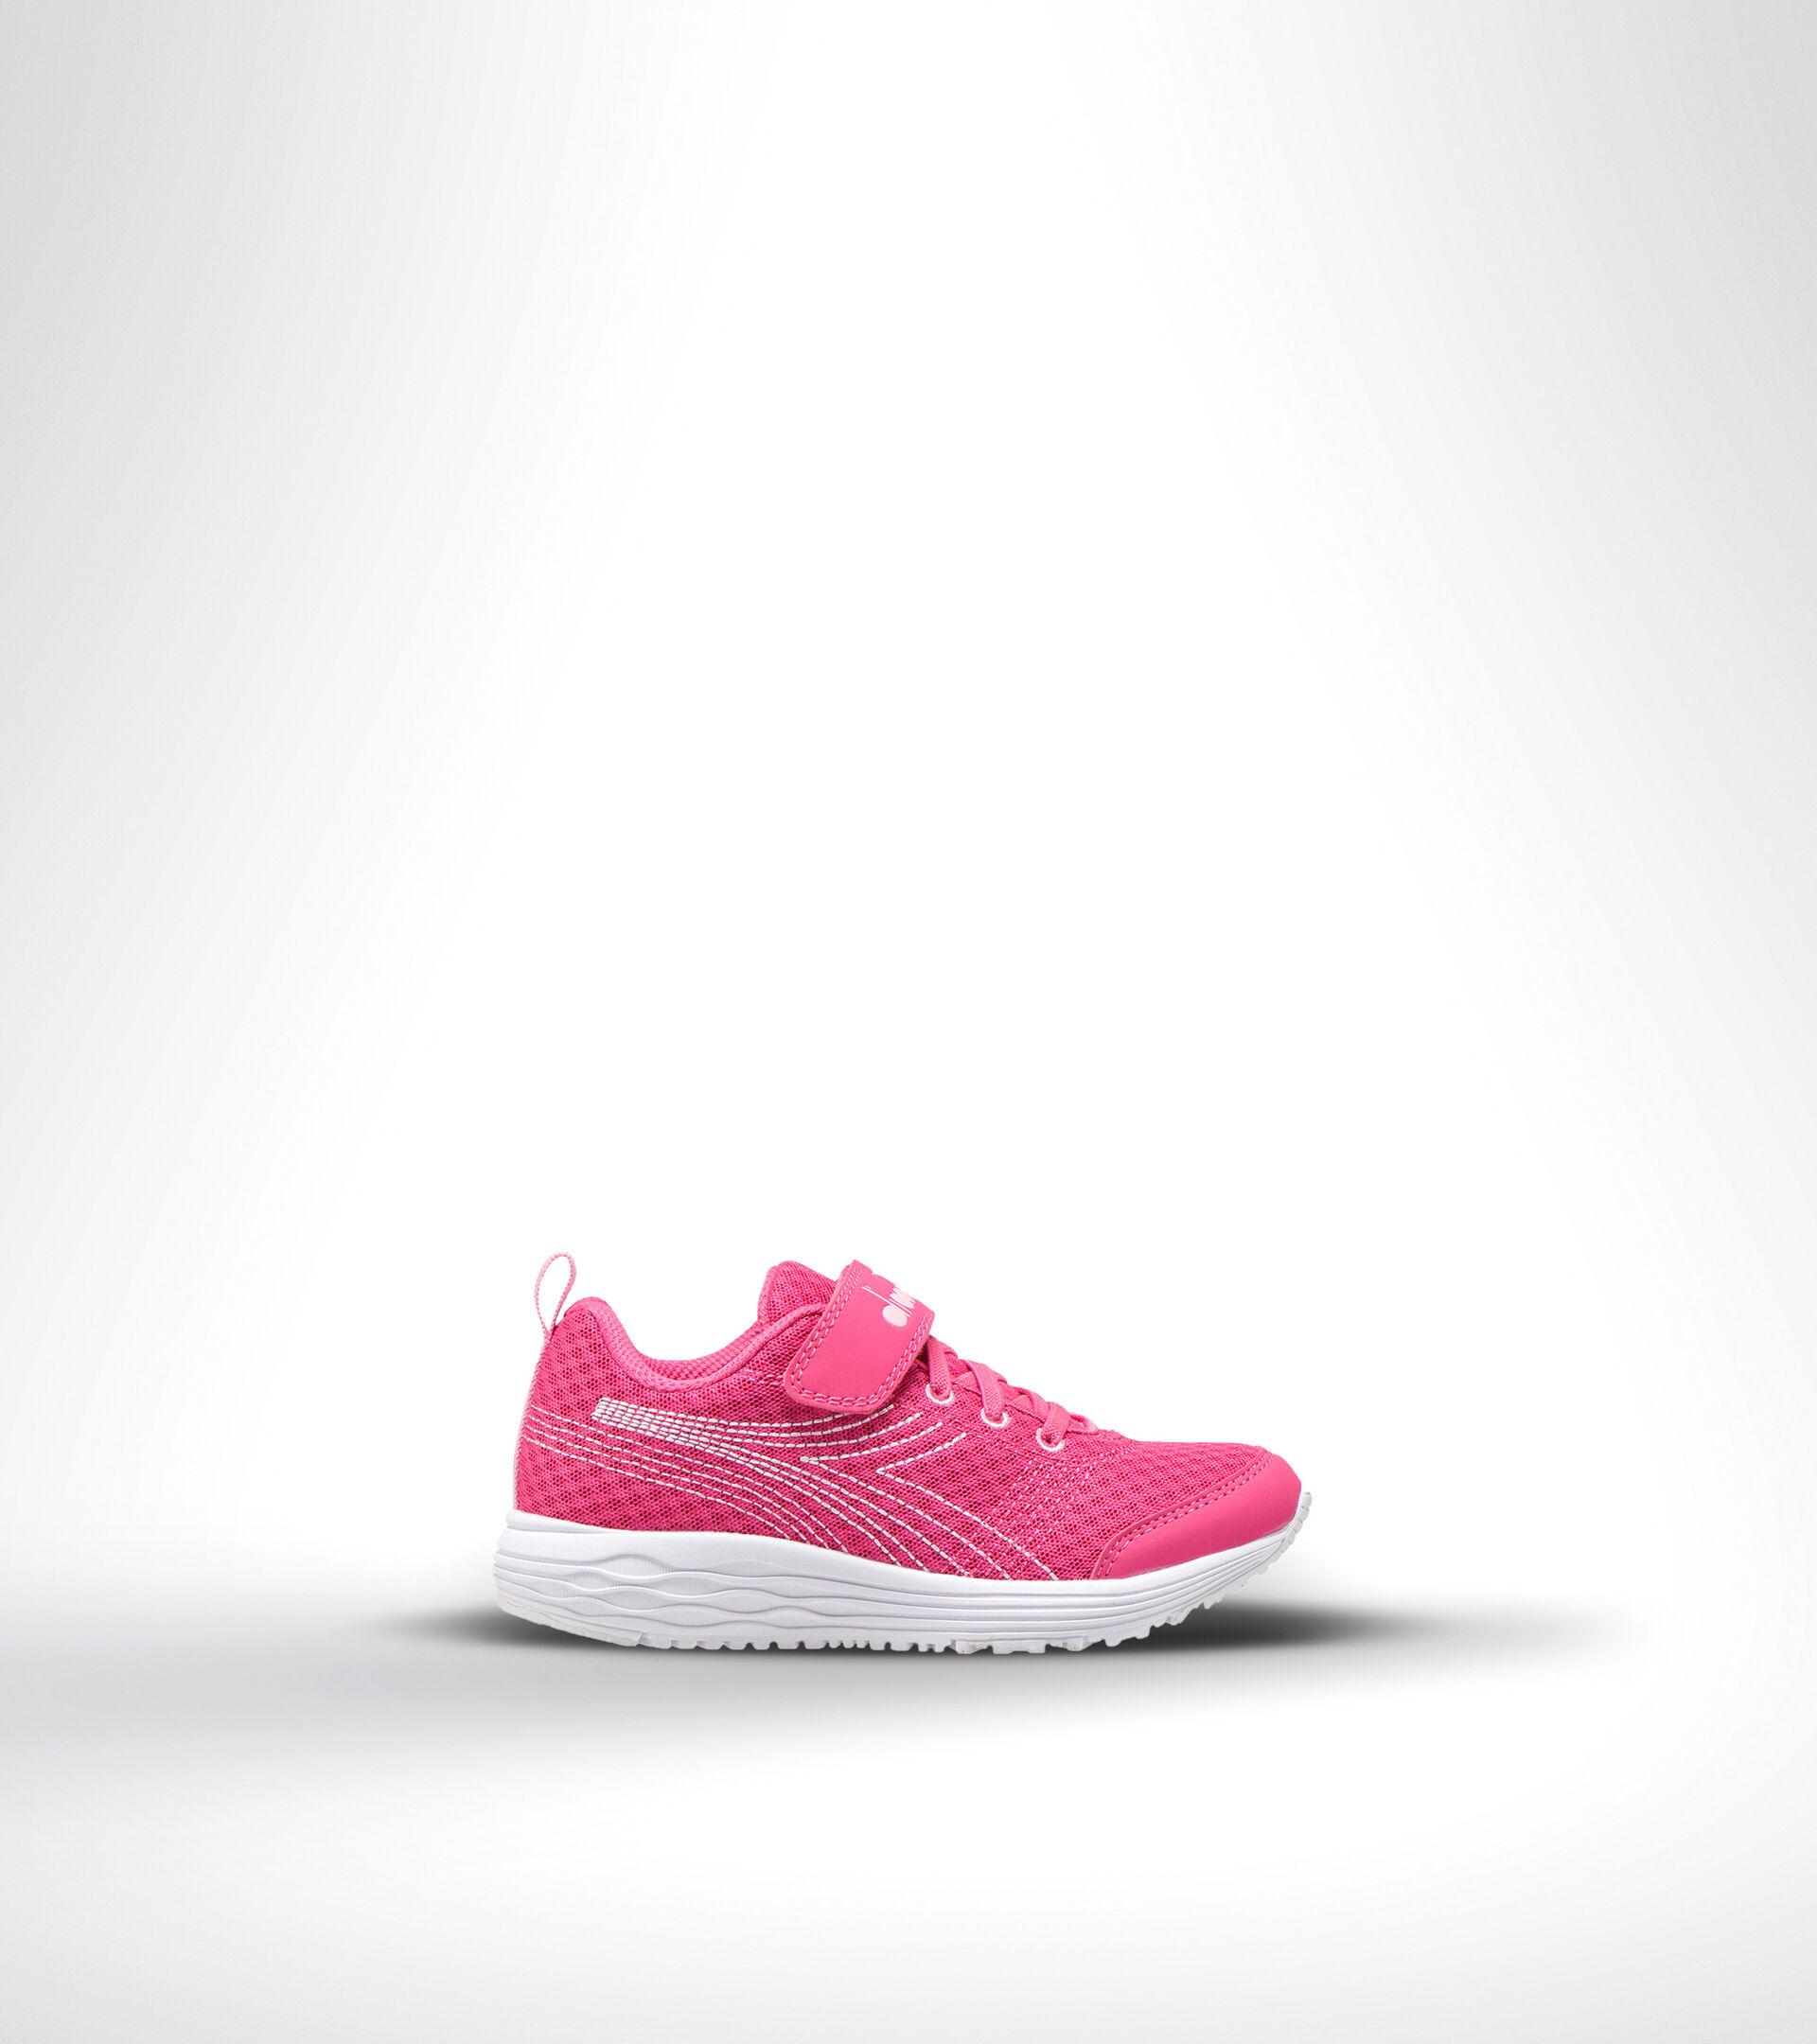 Chaussures de running - Unisexe enfant FLAMINGO 6 JR ROSA FUCSIA/BIANCO - Diadora